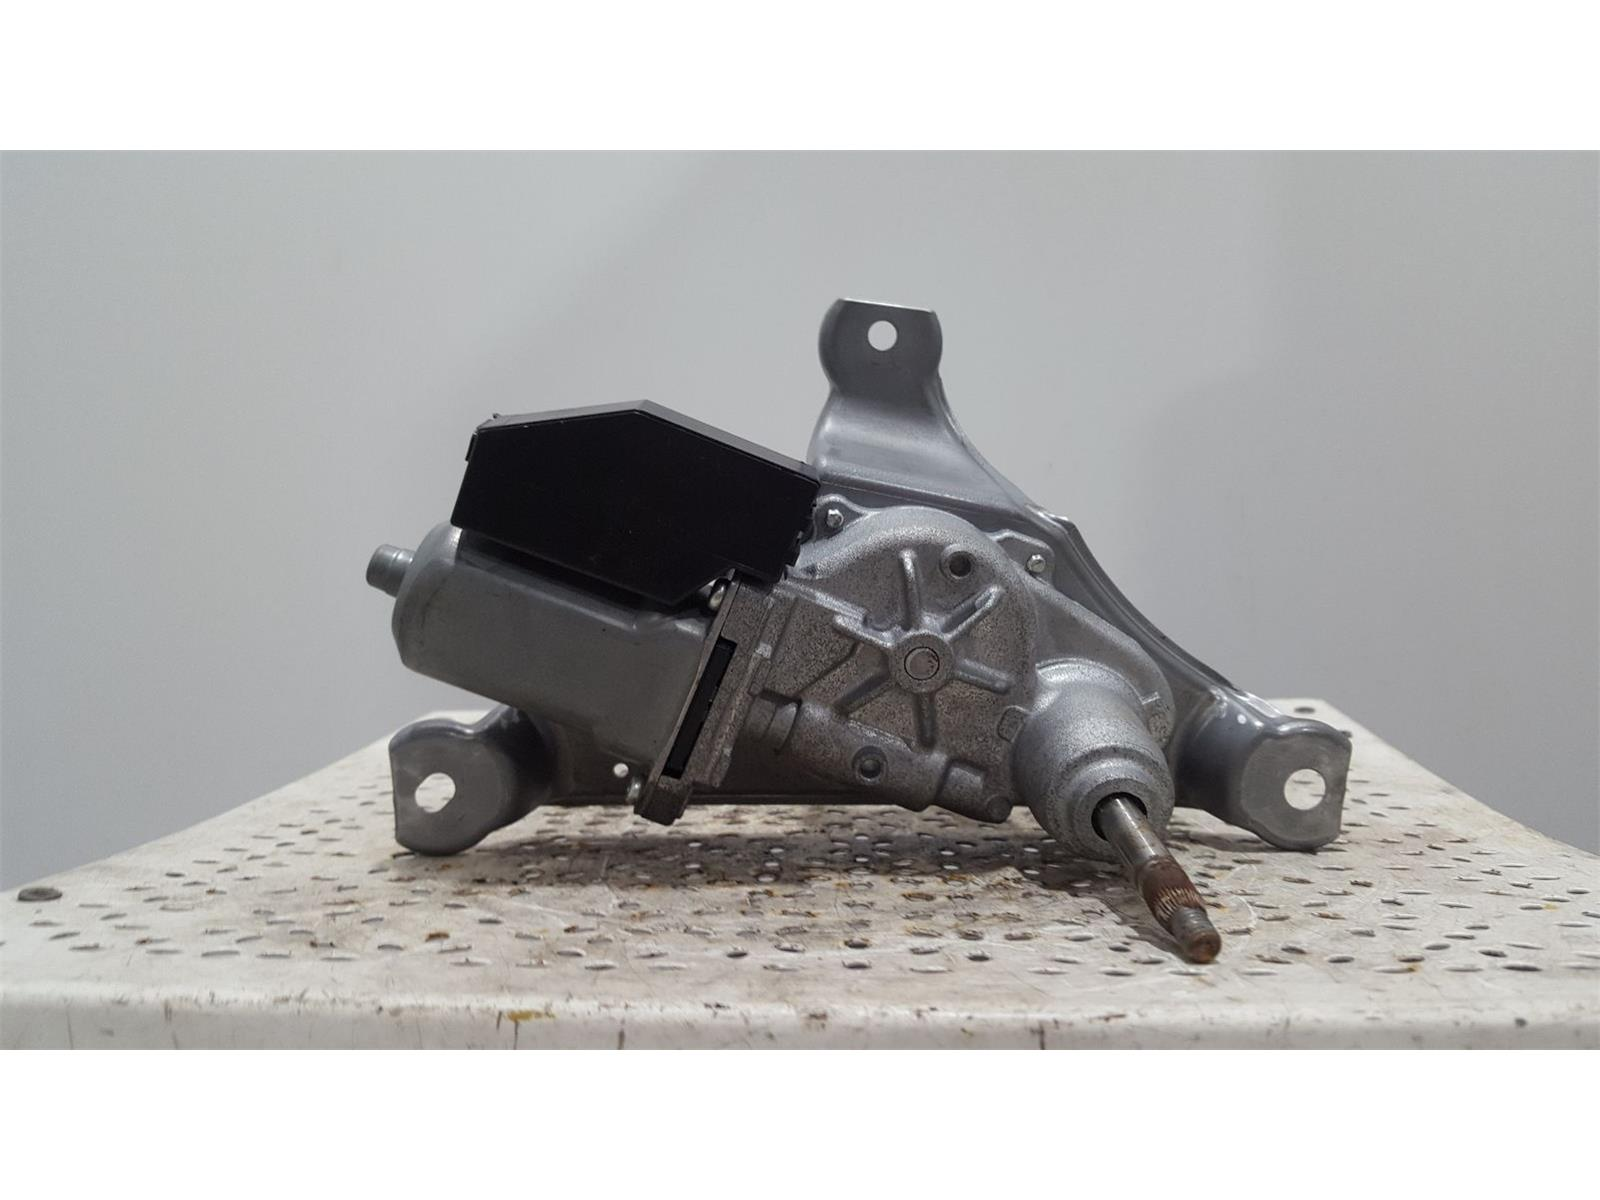 TOYOTA YARIS MK3 (NSP130) 2011 TO 2013 5 DOOR HATCHBACK Rear Wiper Motor